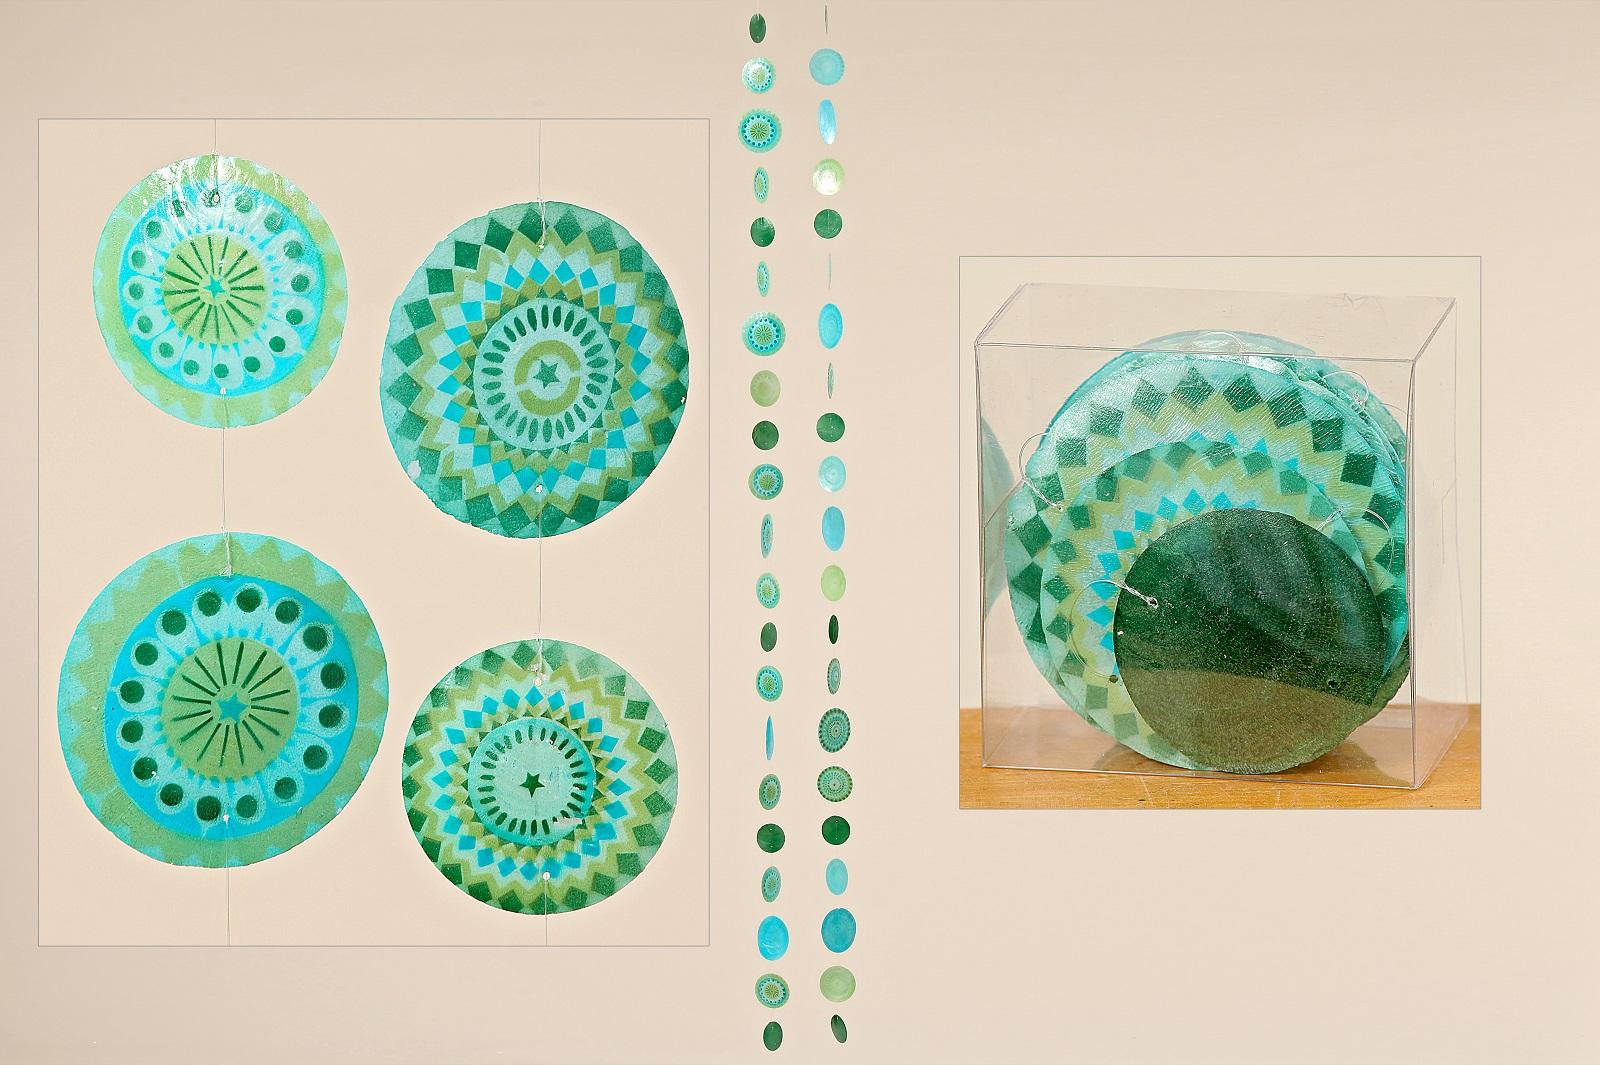 Capiz Muschel Girlande Mobile Windspiel Muschelgirlande grün blau Stückpreis